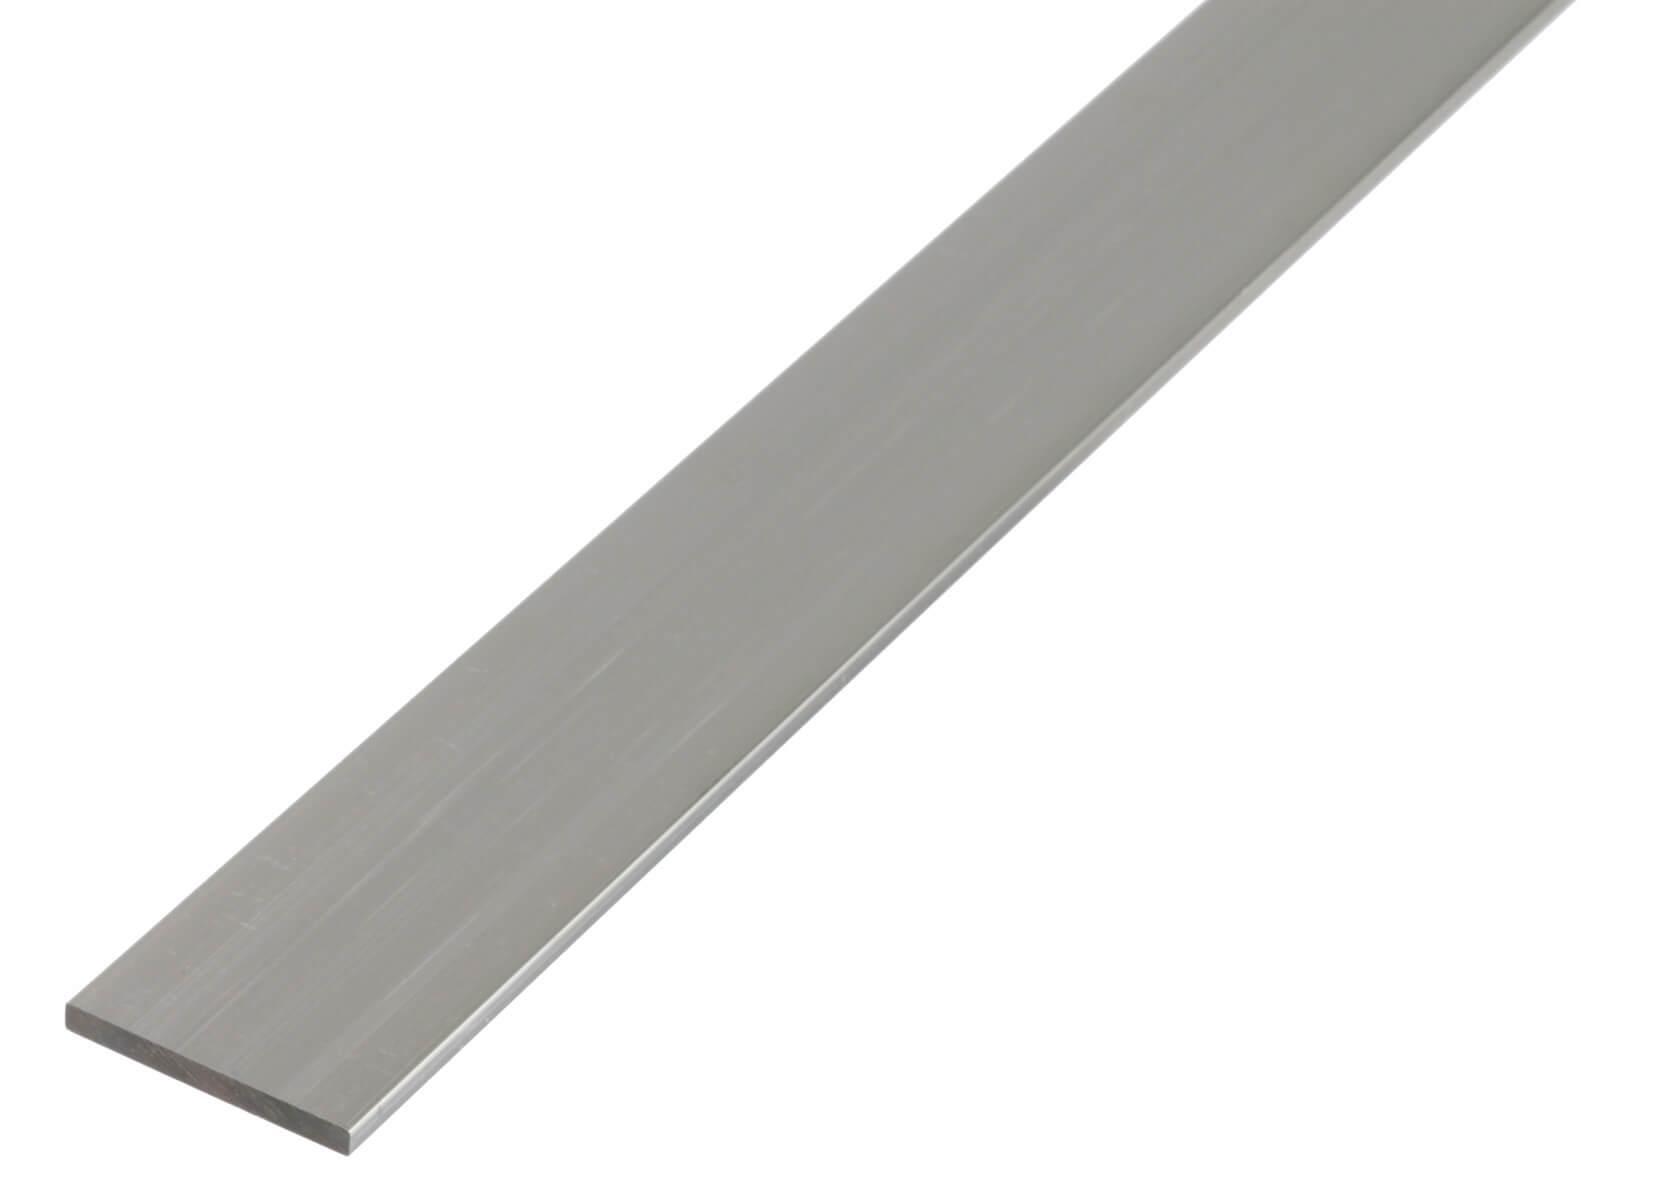 GAH-Alberts 469375 Flachstange natur Aluminium 1000 x 15 x 2 mm